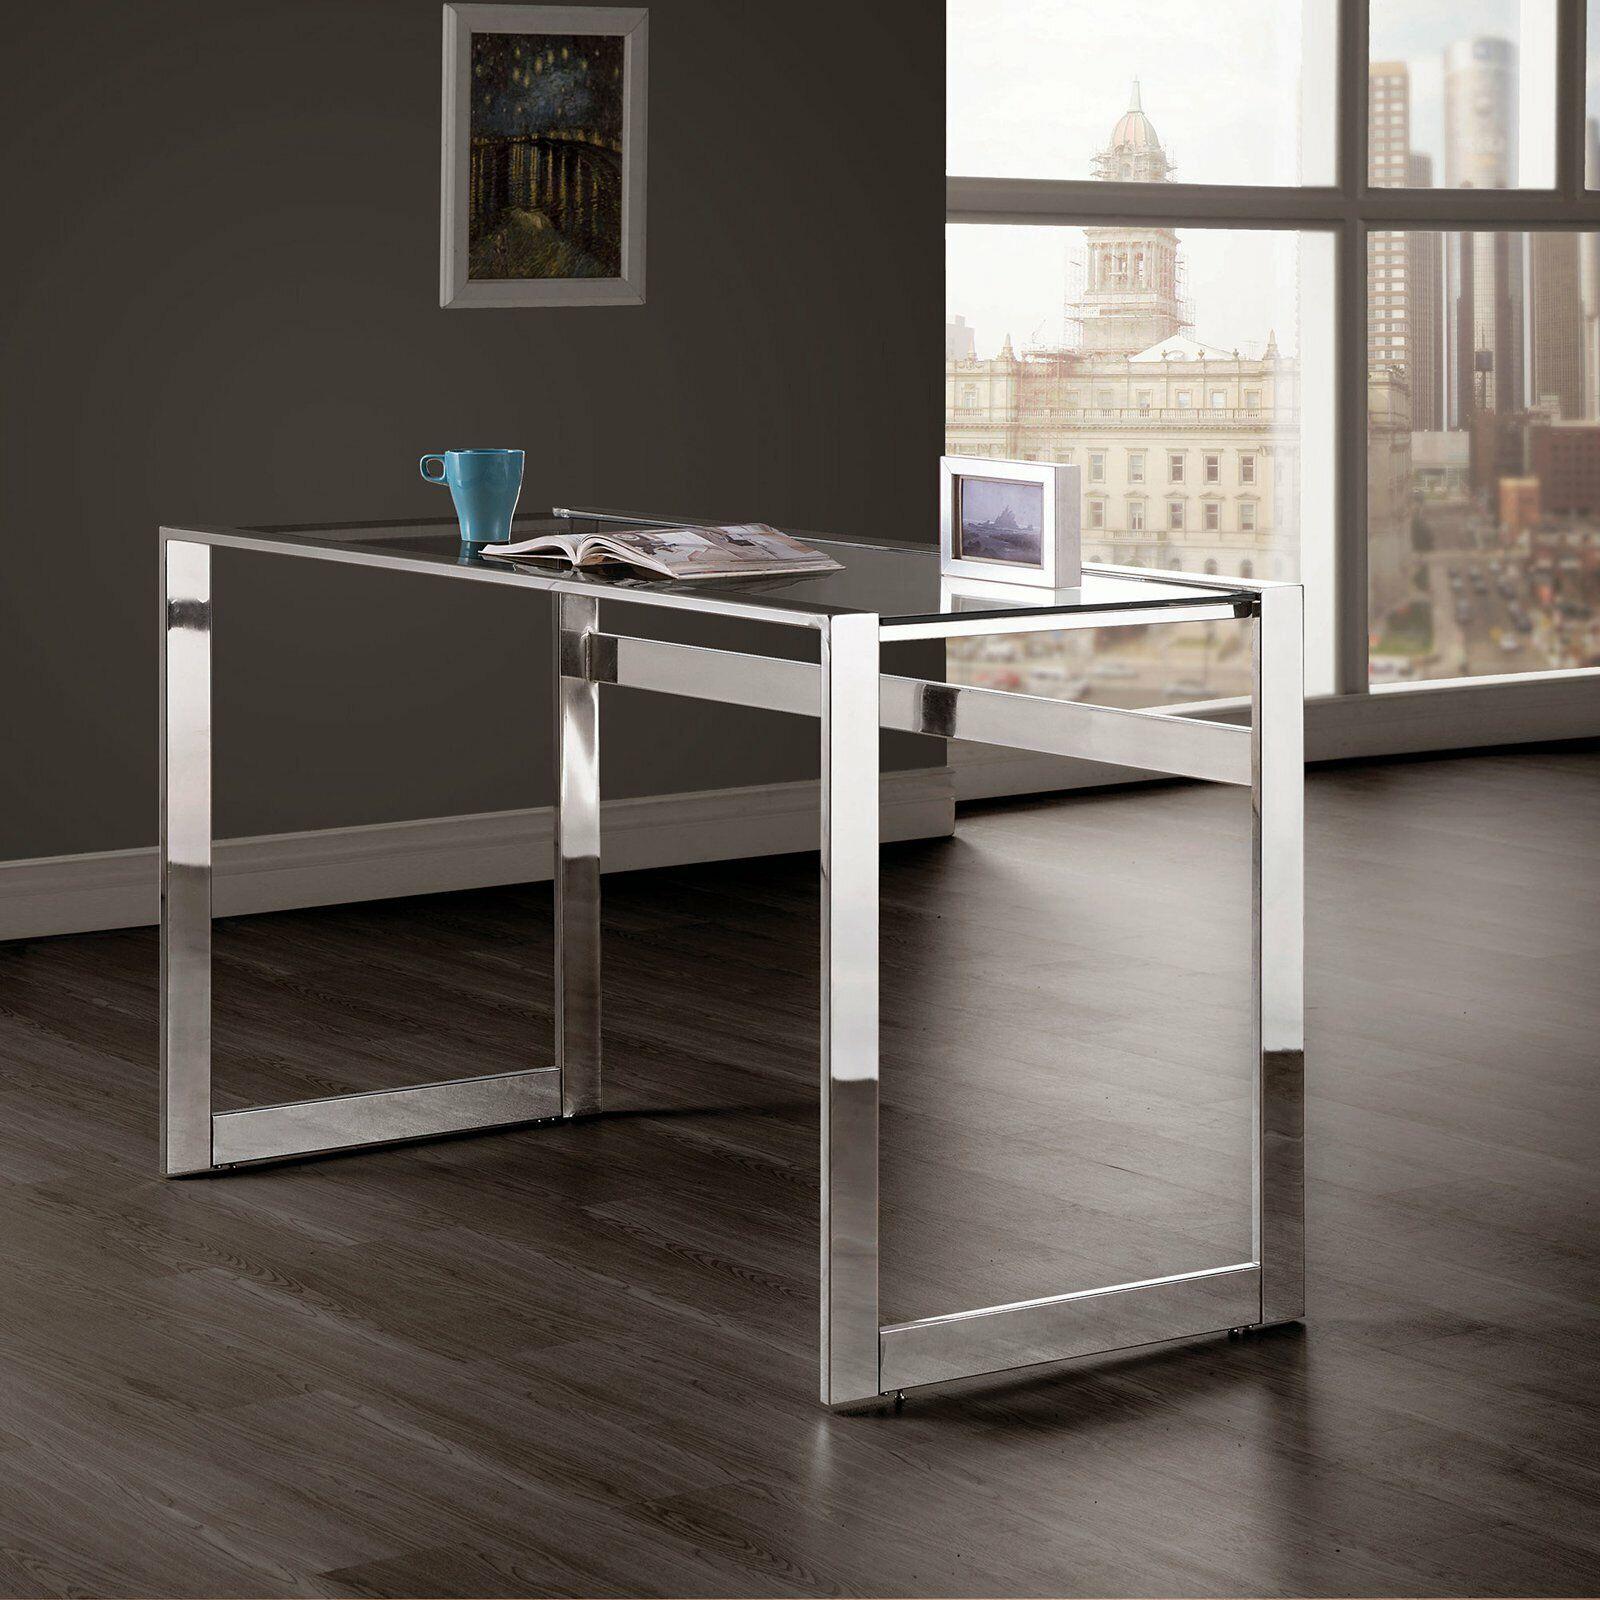 Mainstays Versatile Modern Glass Top Desk Multiple Colors For Sale Online Ebay